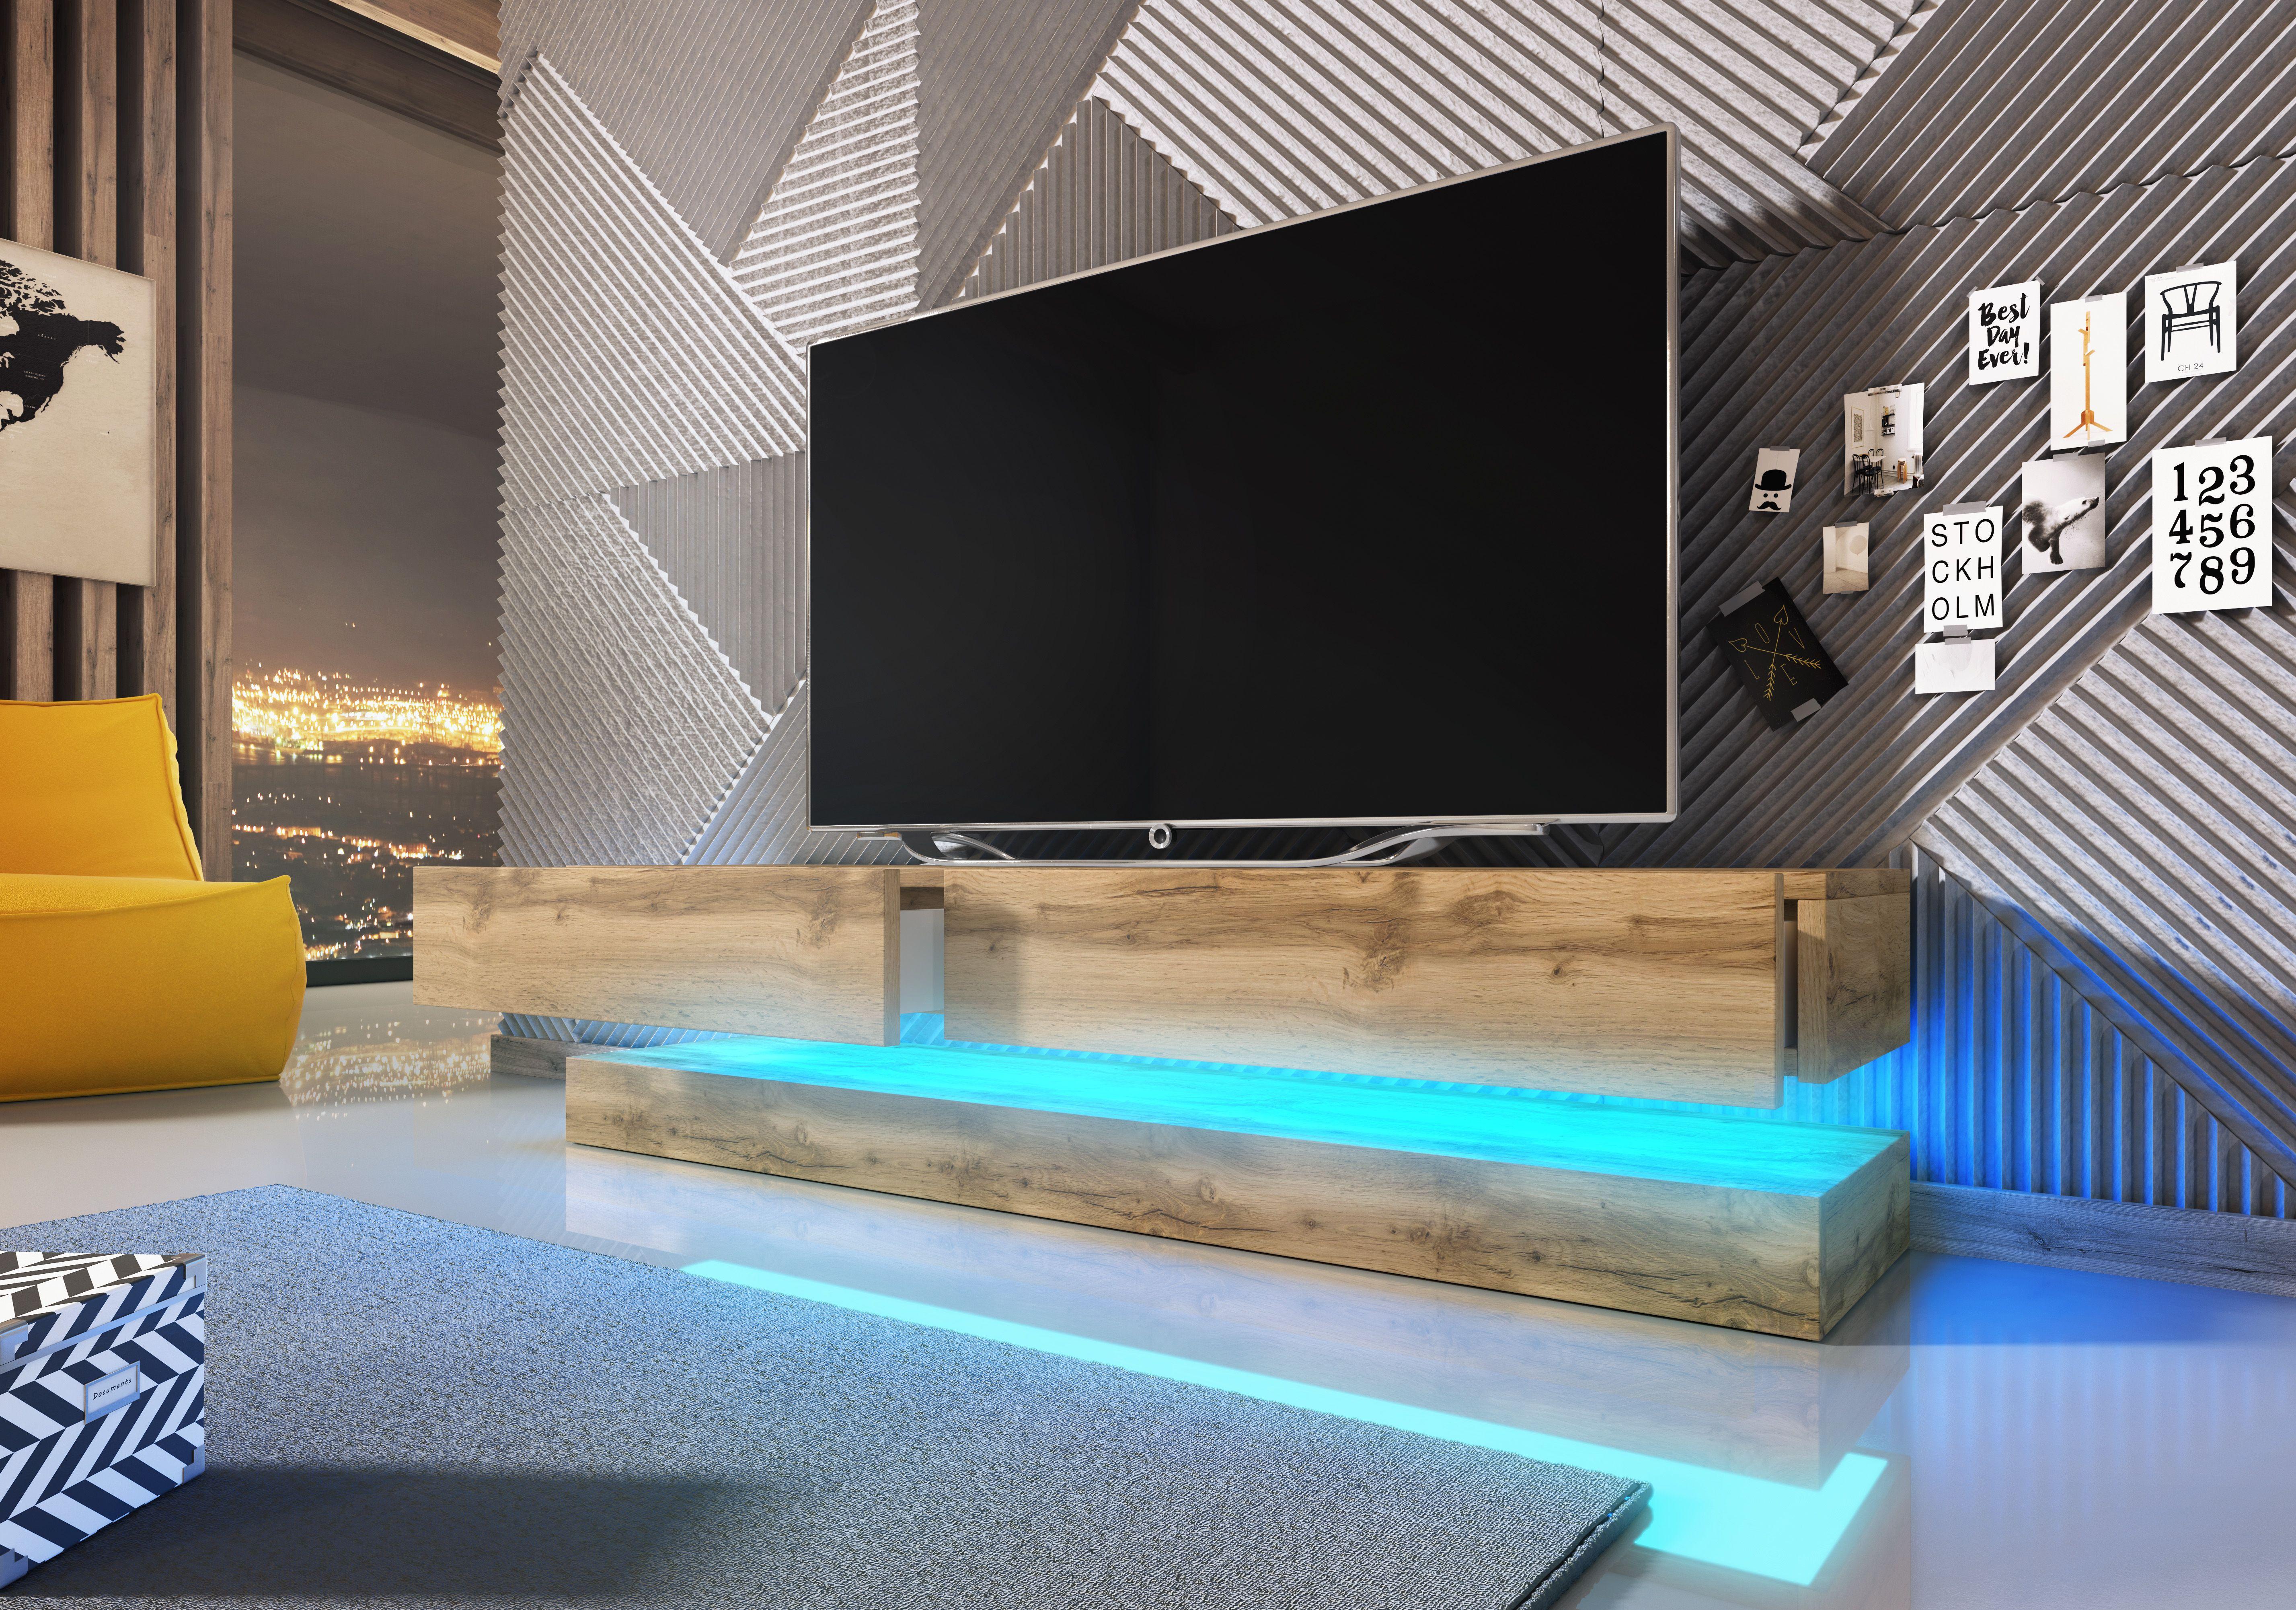 Nowoczesna Szafka Wiszaca Rtv Fyl Nowosc 6983712124 Oficjalne Archiwum Allegro Tv Stand Floating Tv Stand Tv Lowboard